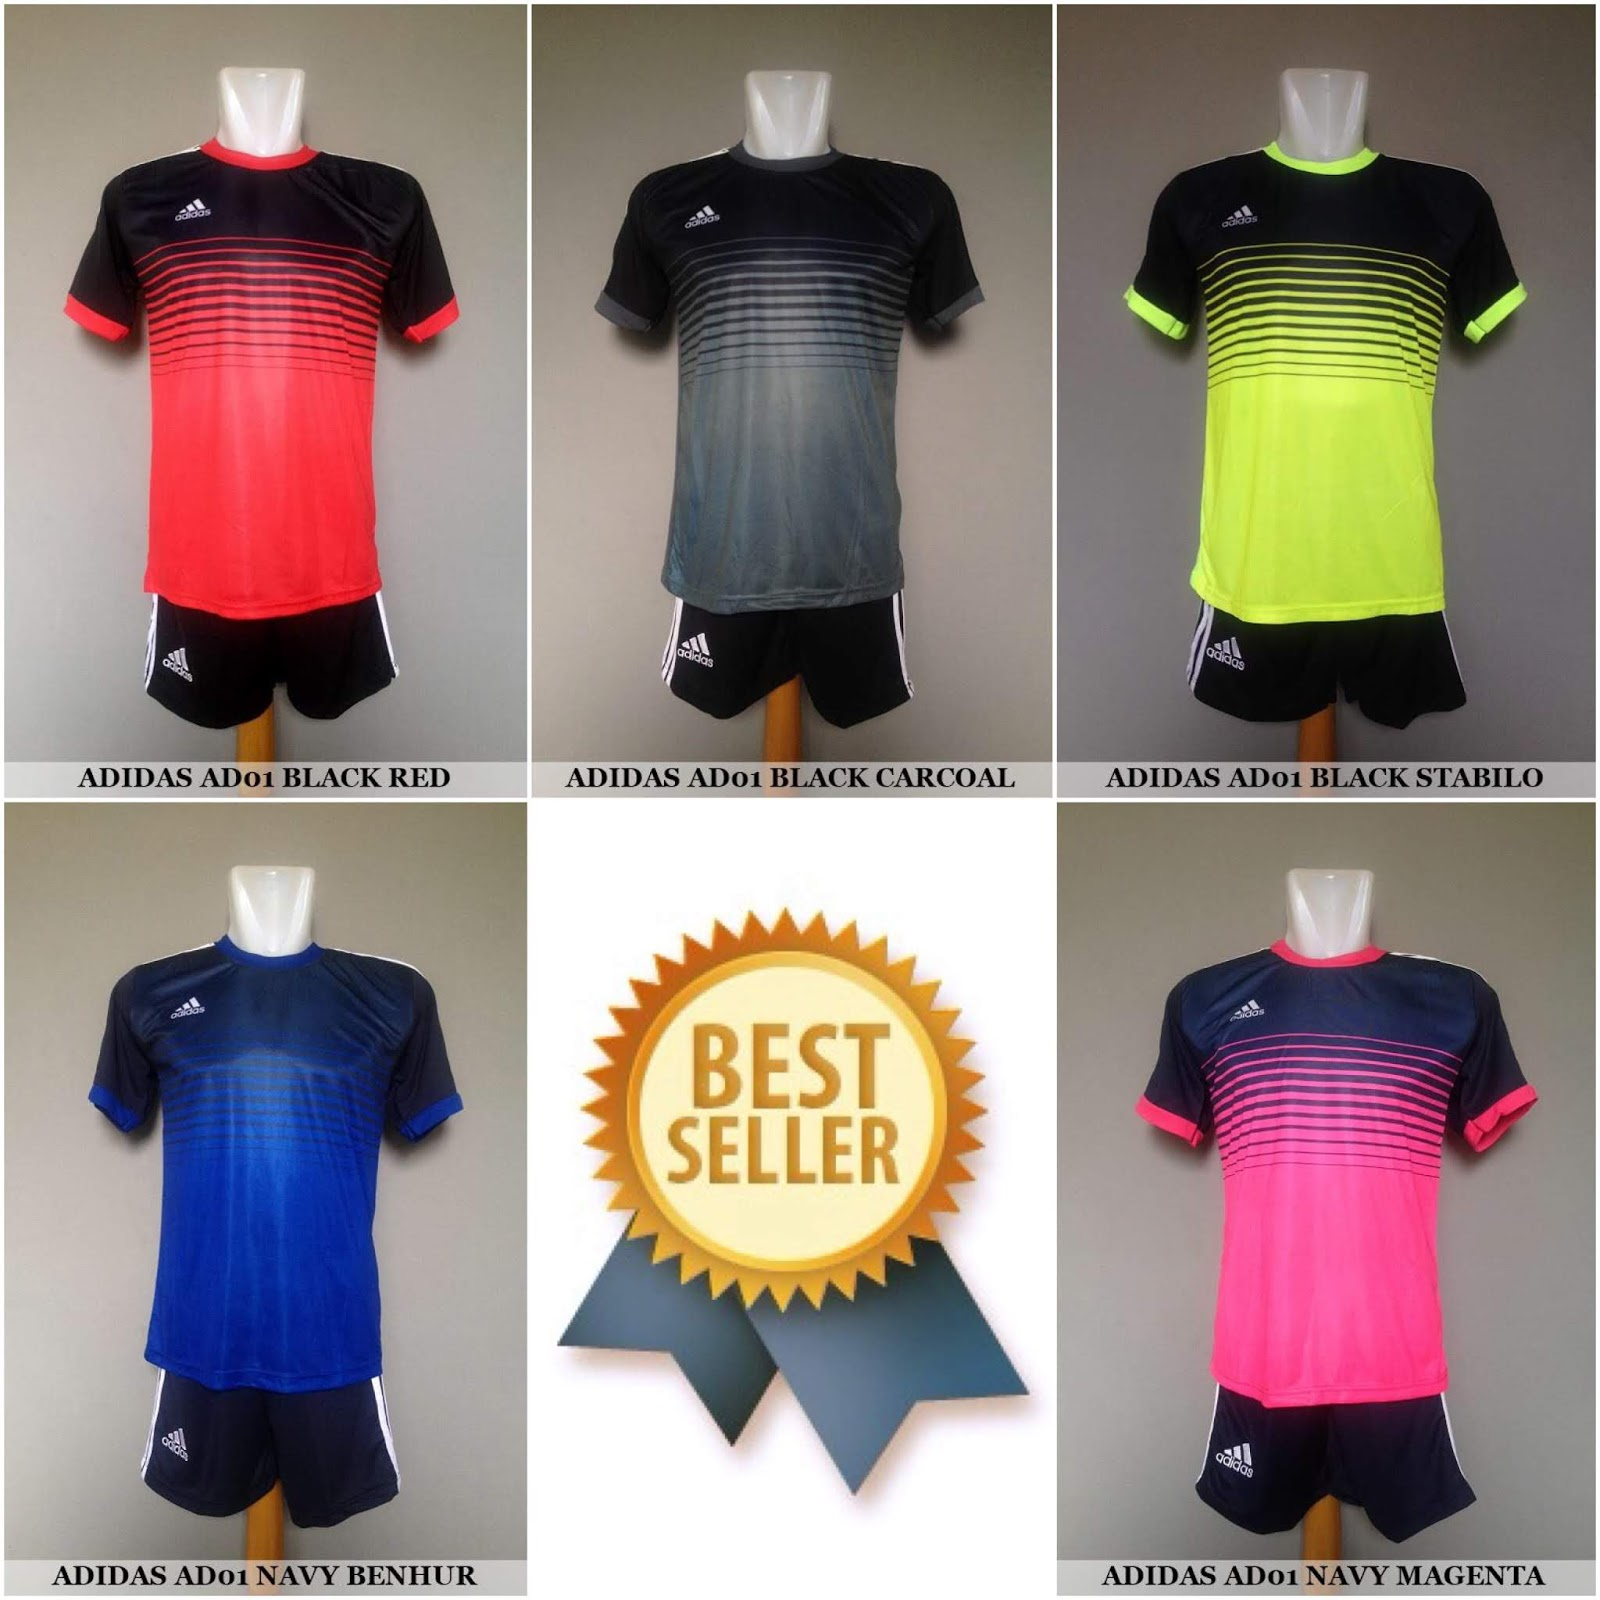 440 Desain Baju Futsal Keren Depan Belakang HD